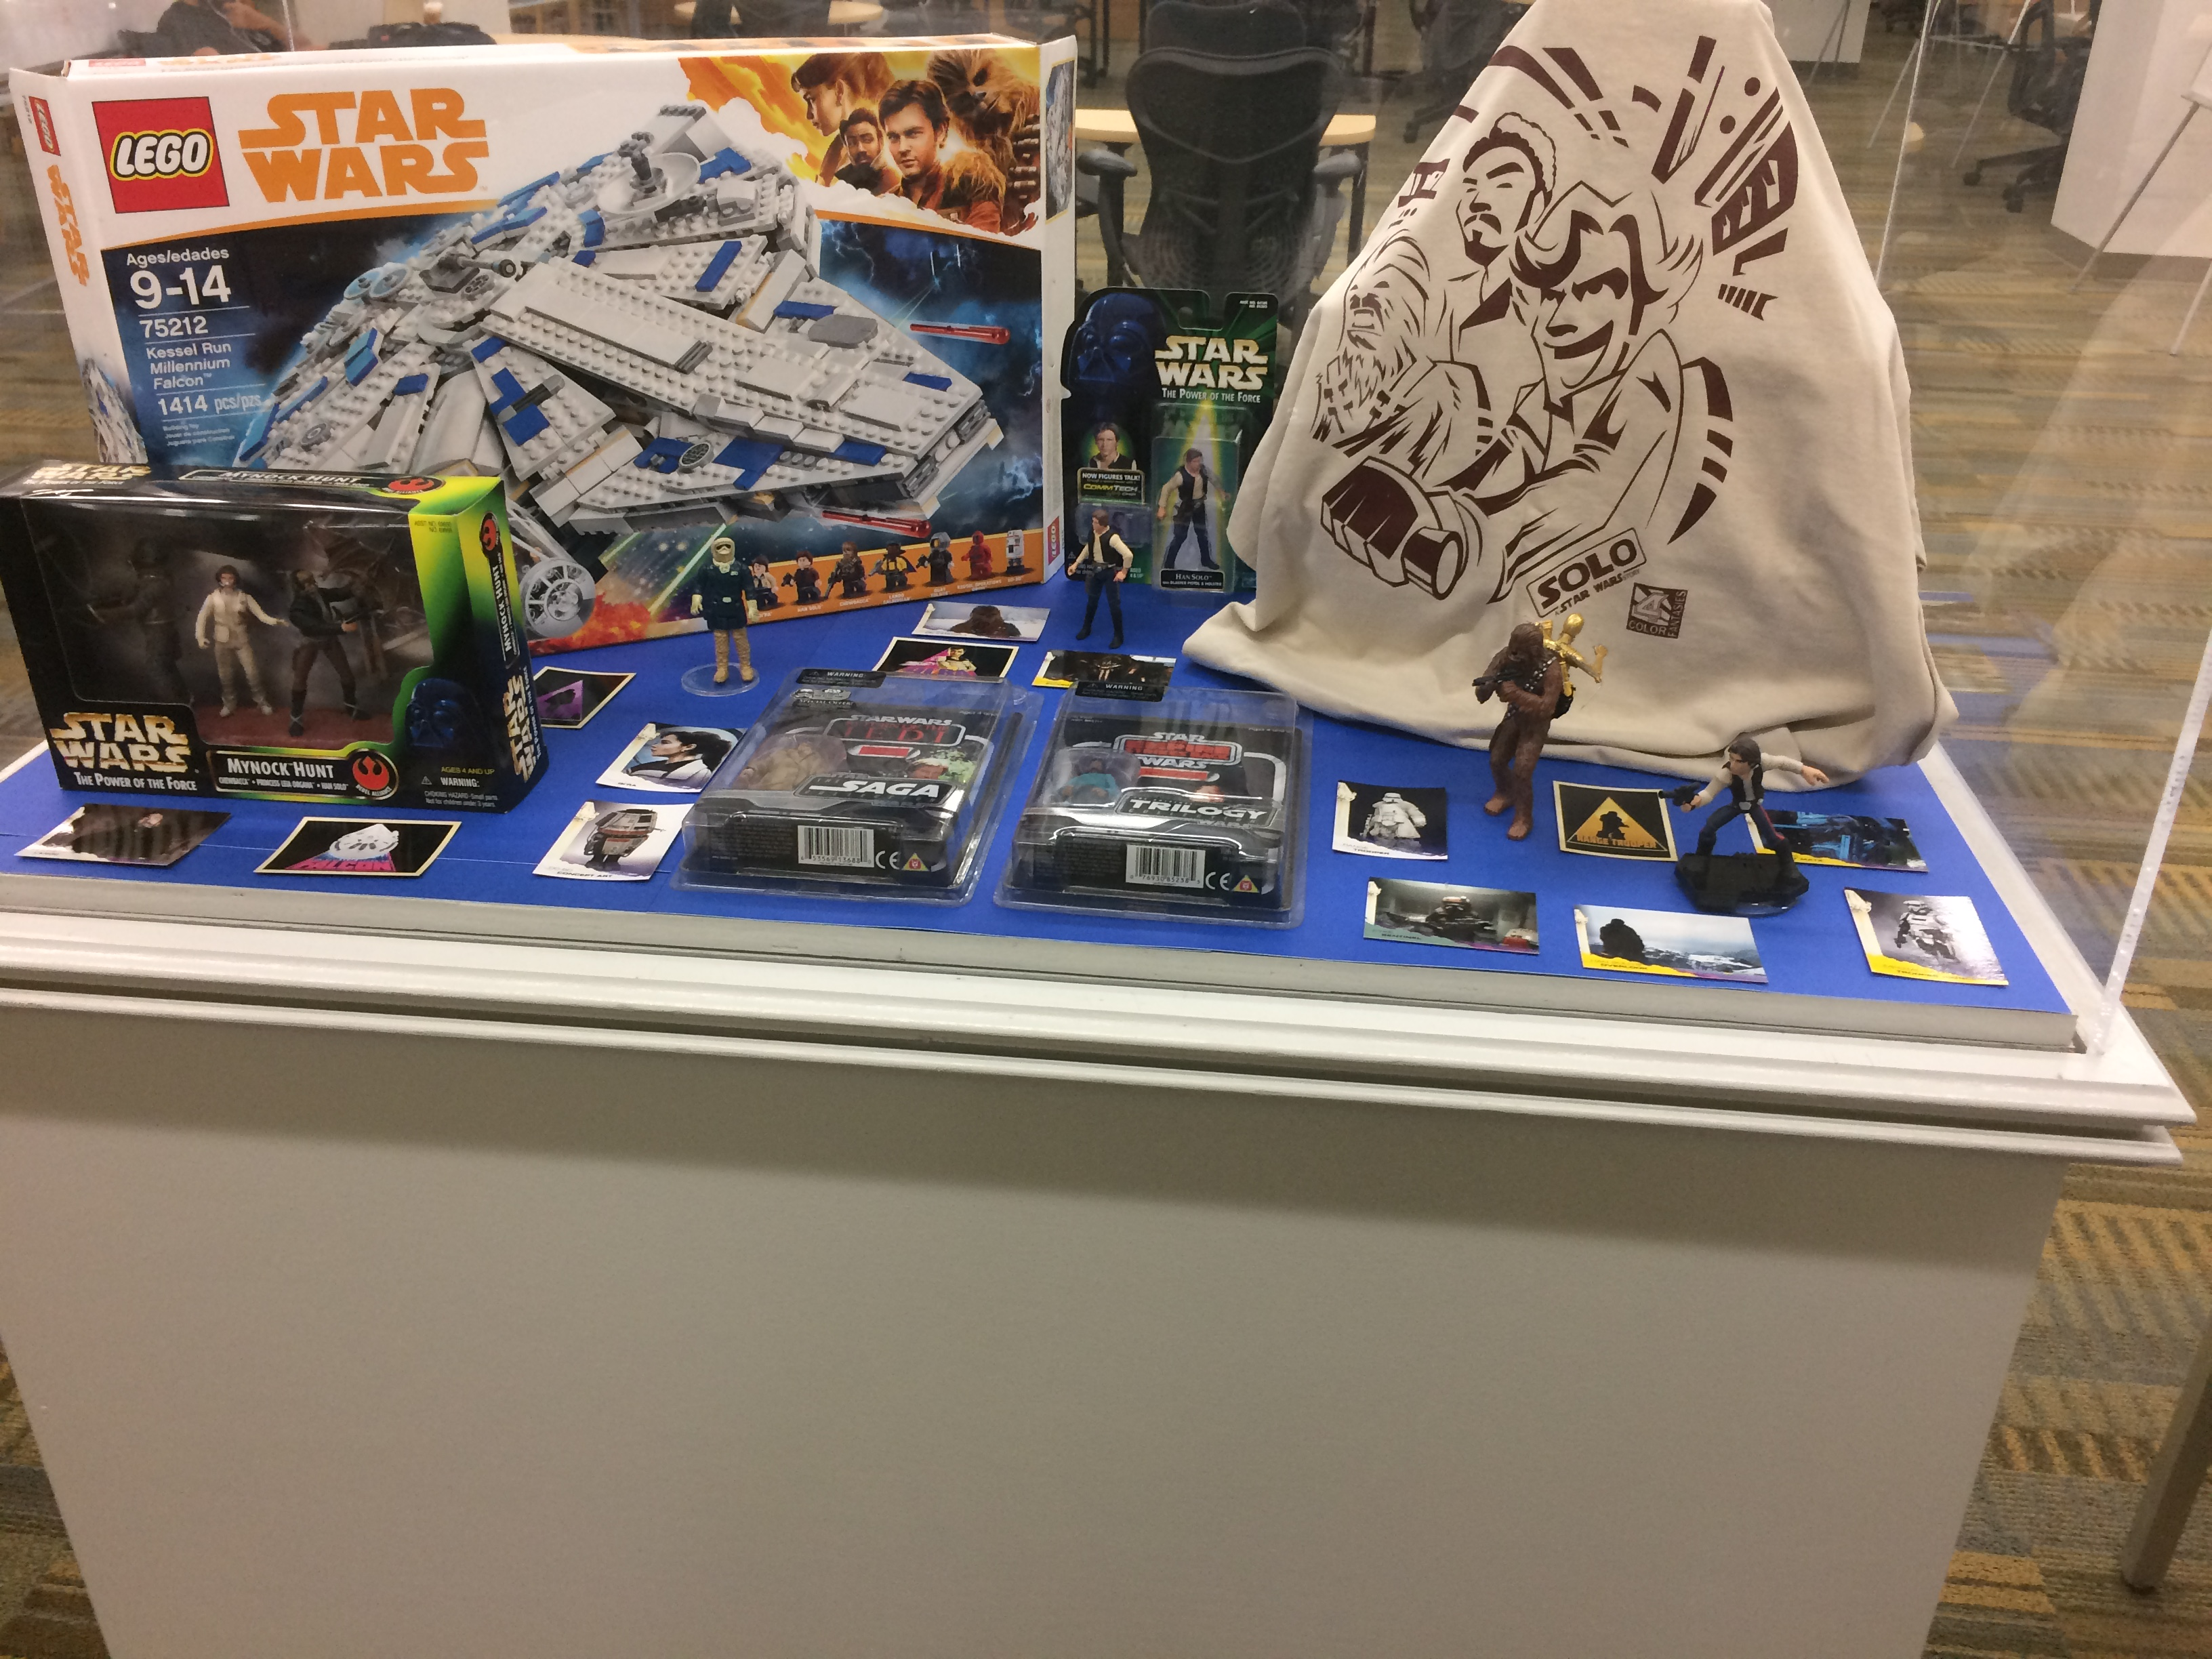 Solo Star Wars Display